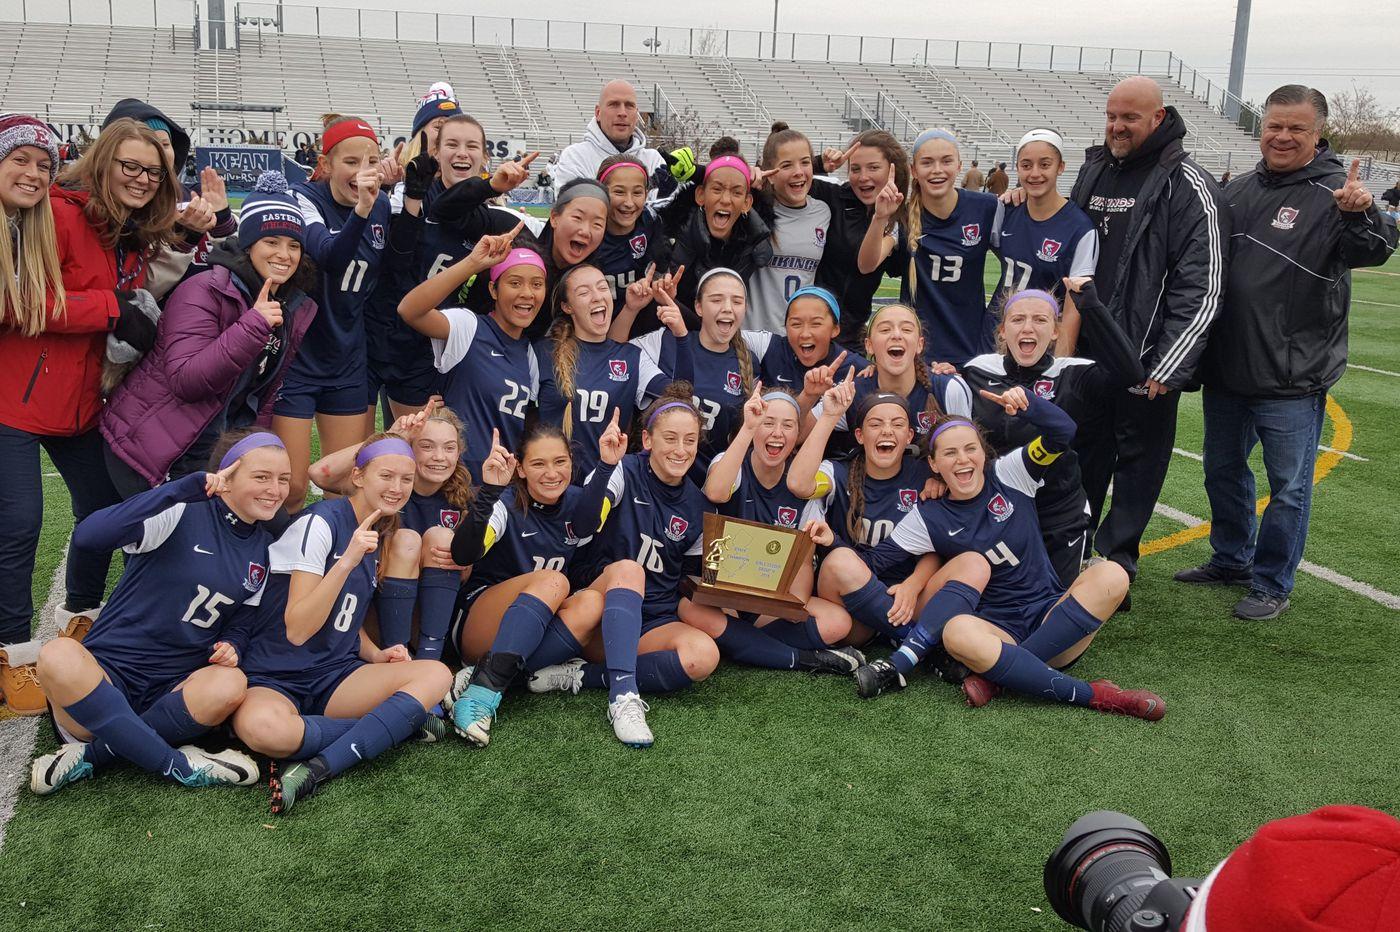 Eastern girls capture state soccer title on Kelli McGroarty's goal